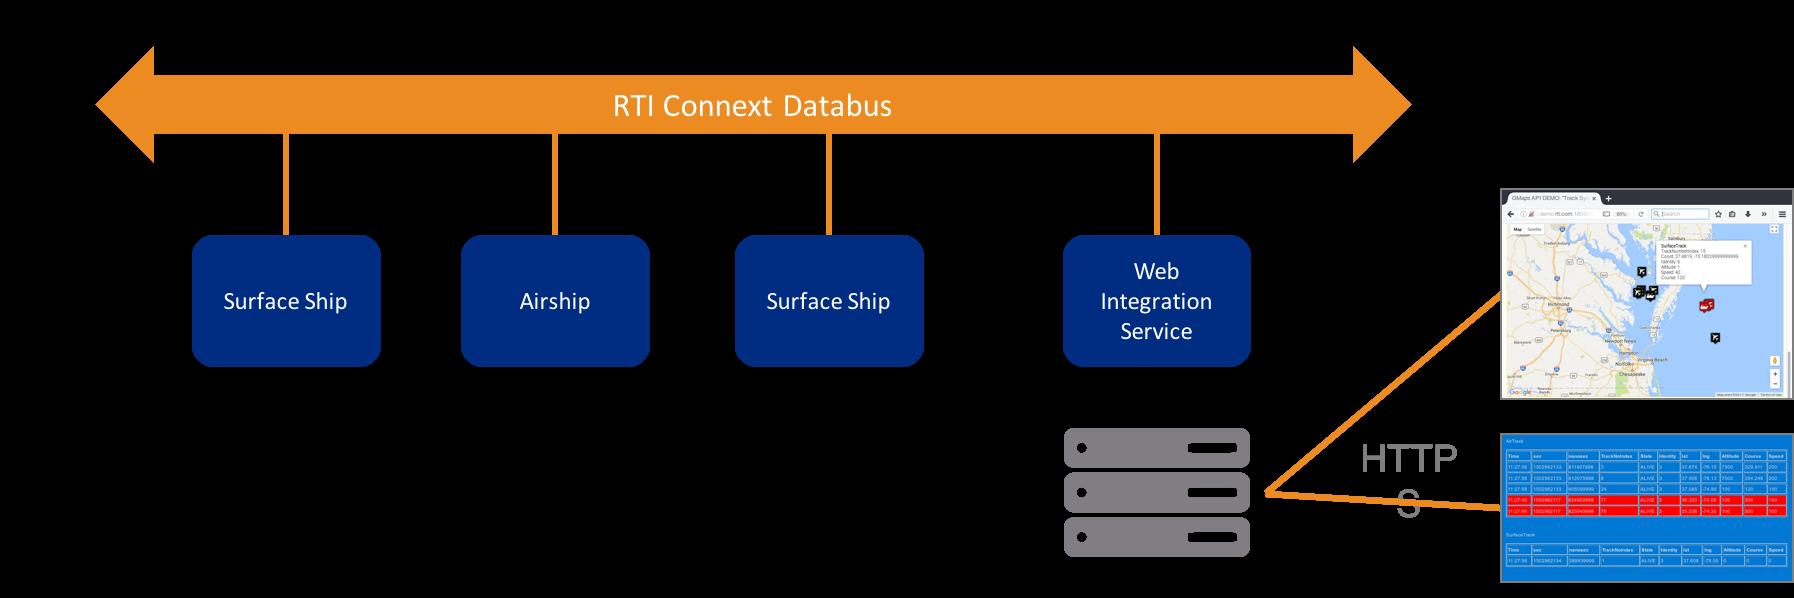 WebIntegrationService_Databus.png